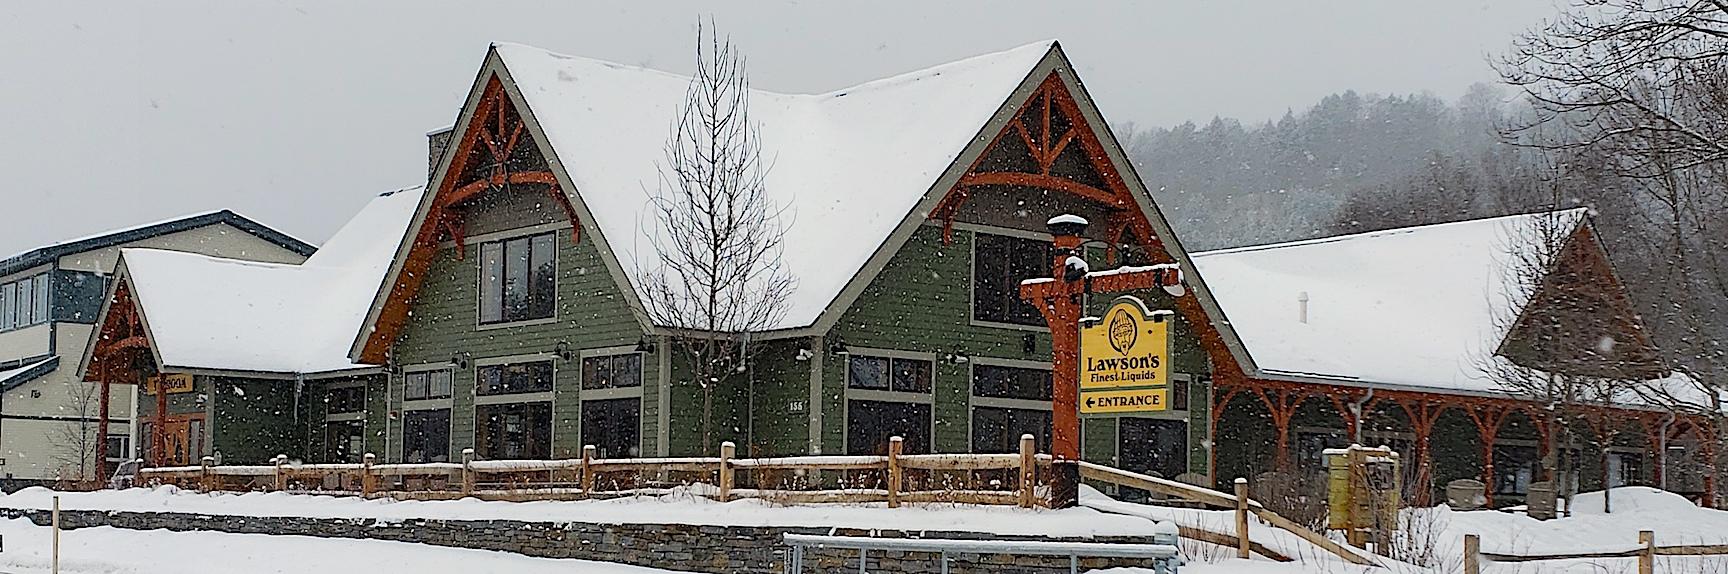 Lawson's Finest Liquids Brewery, Waitsfield, Vermont